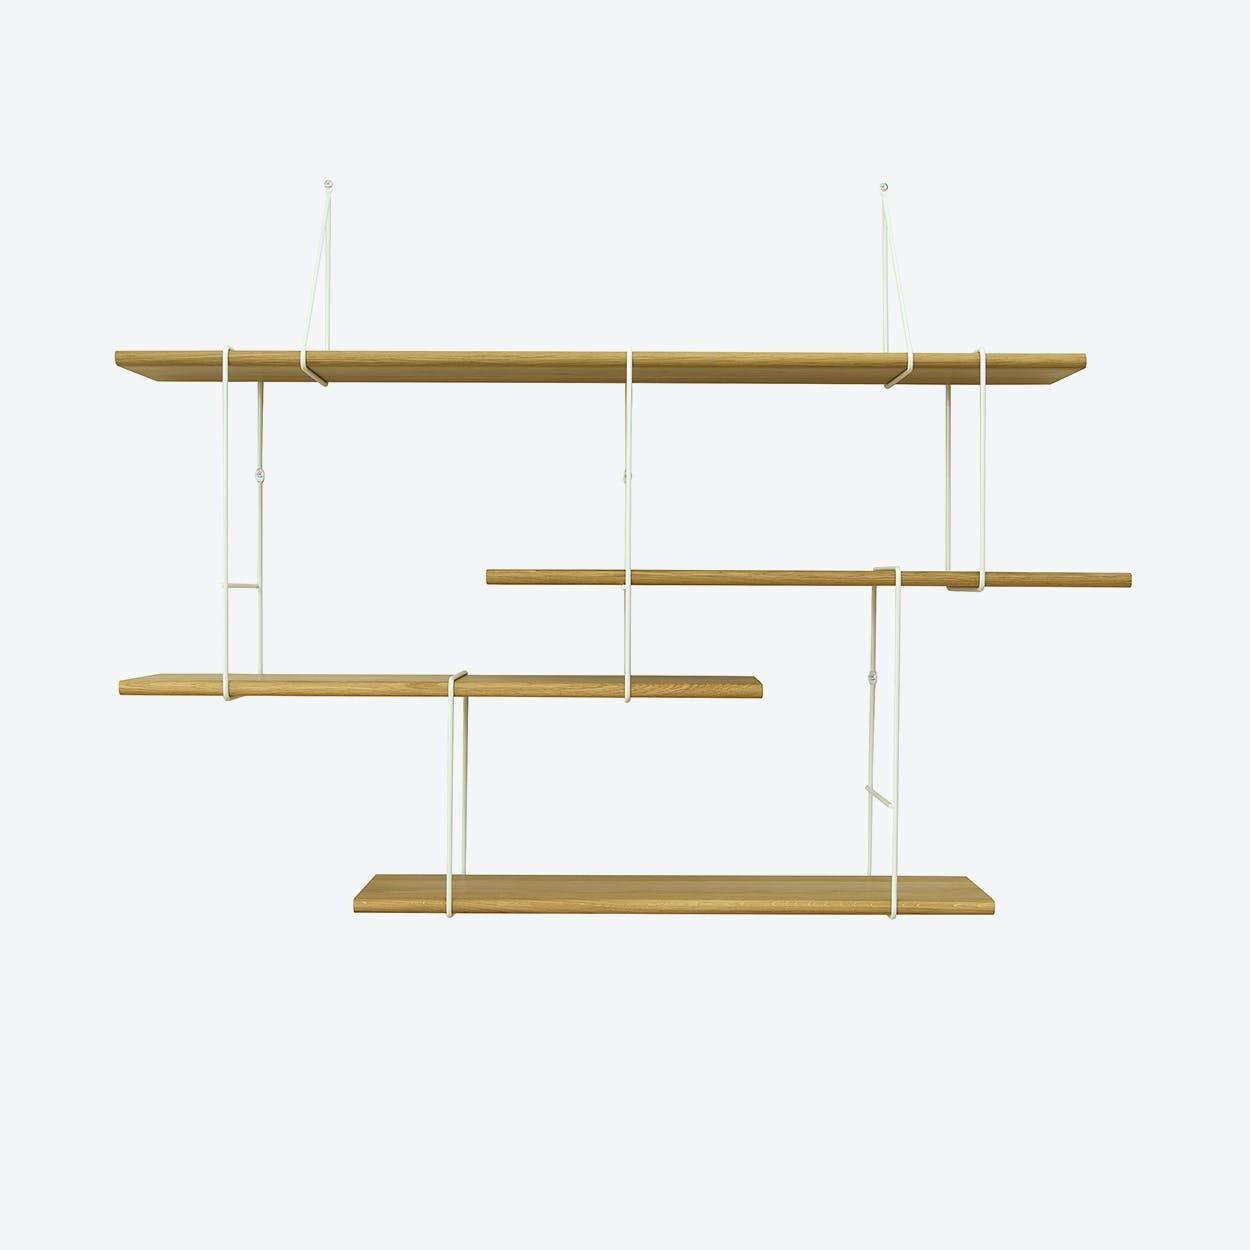 LINK Shelf, Setup 1, in Oak/White